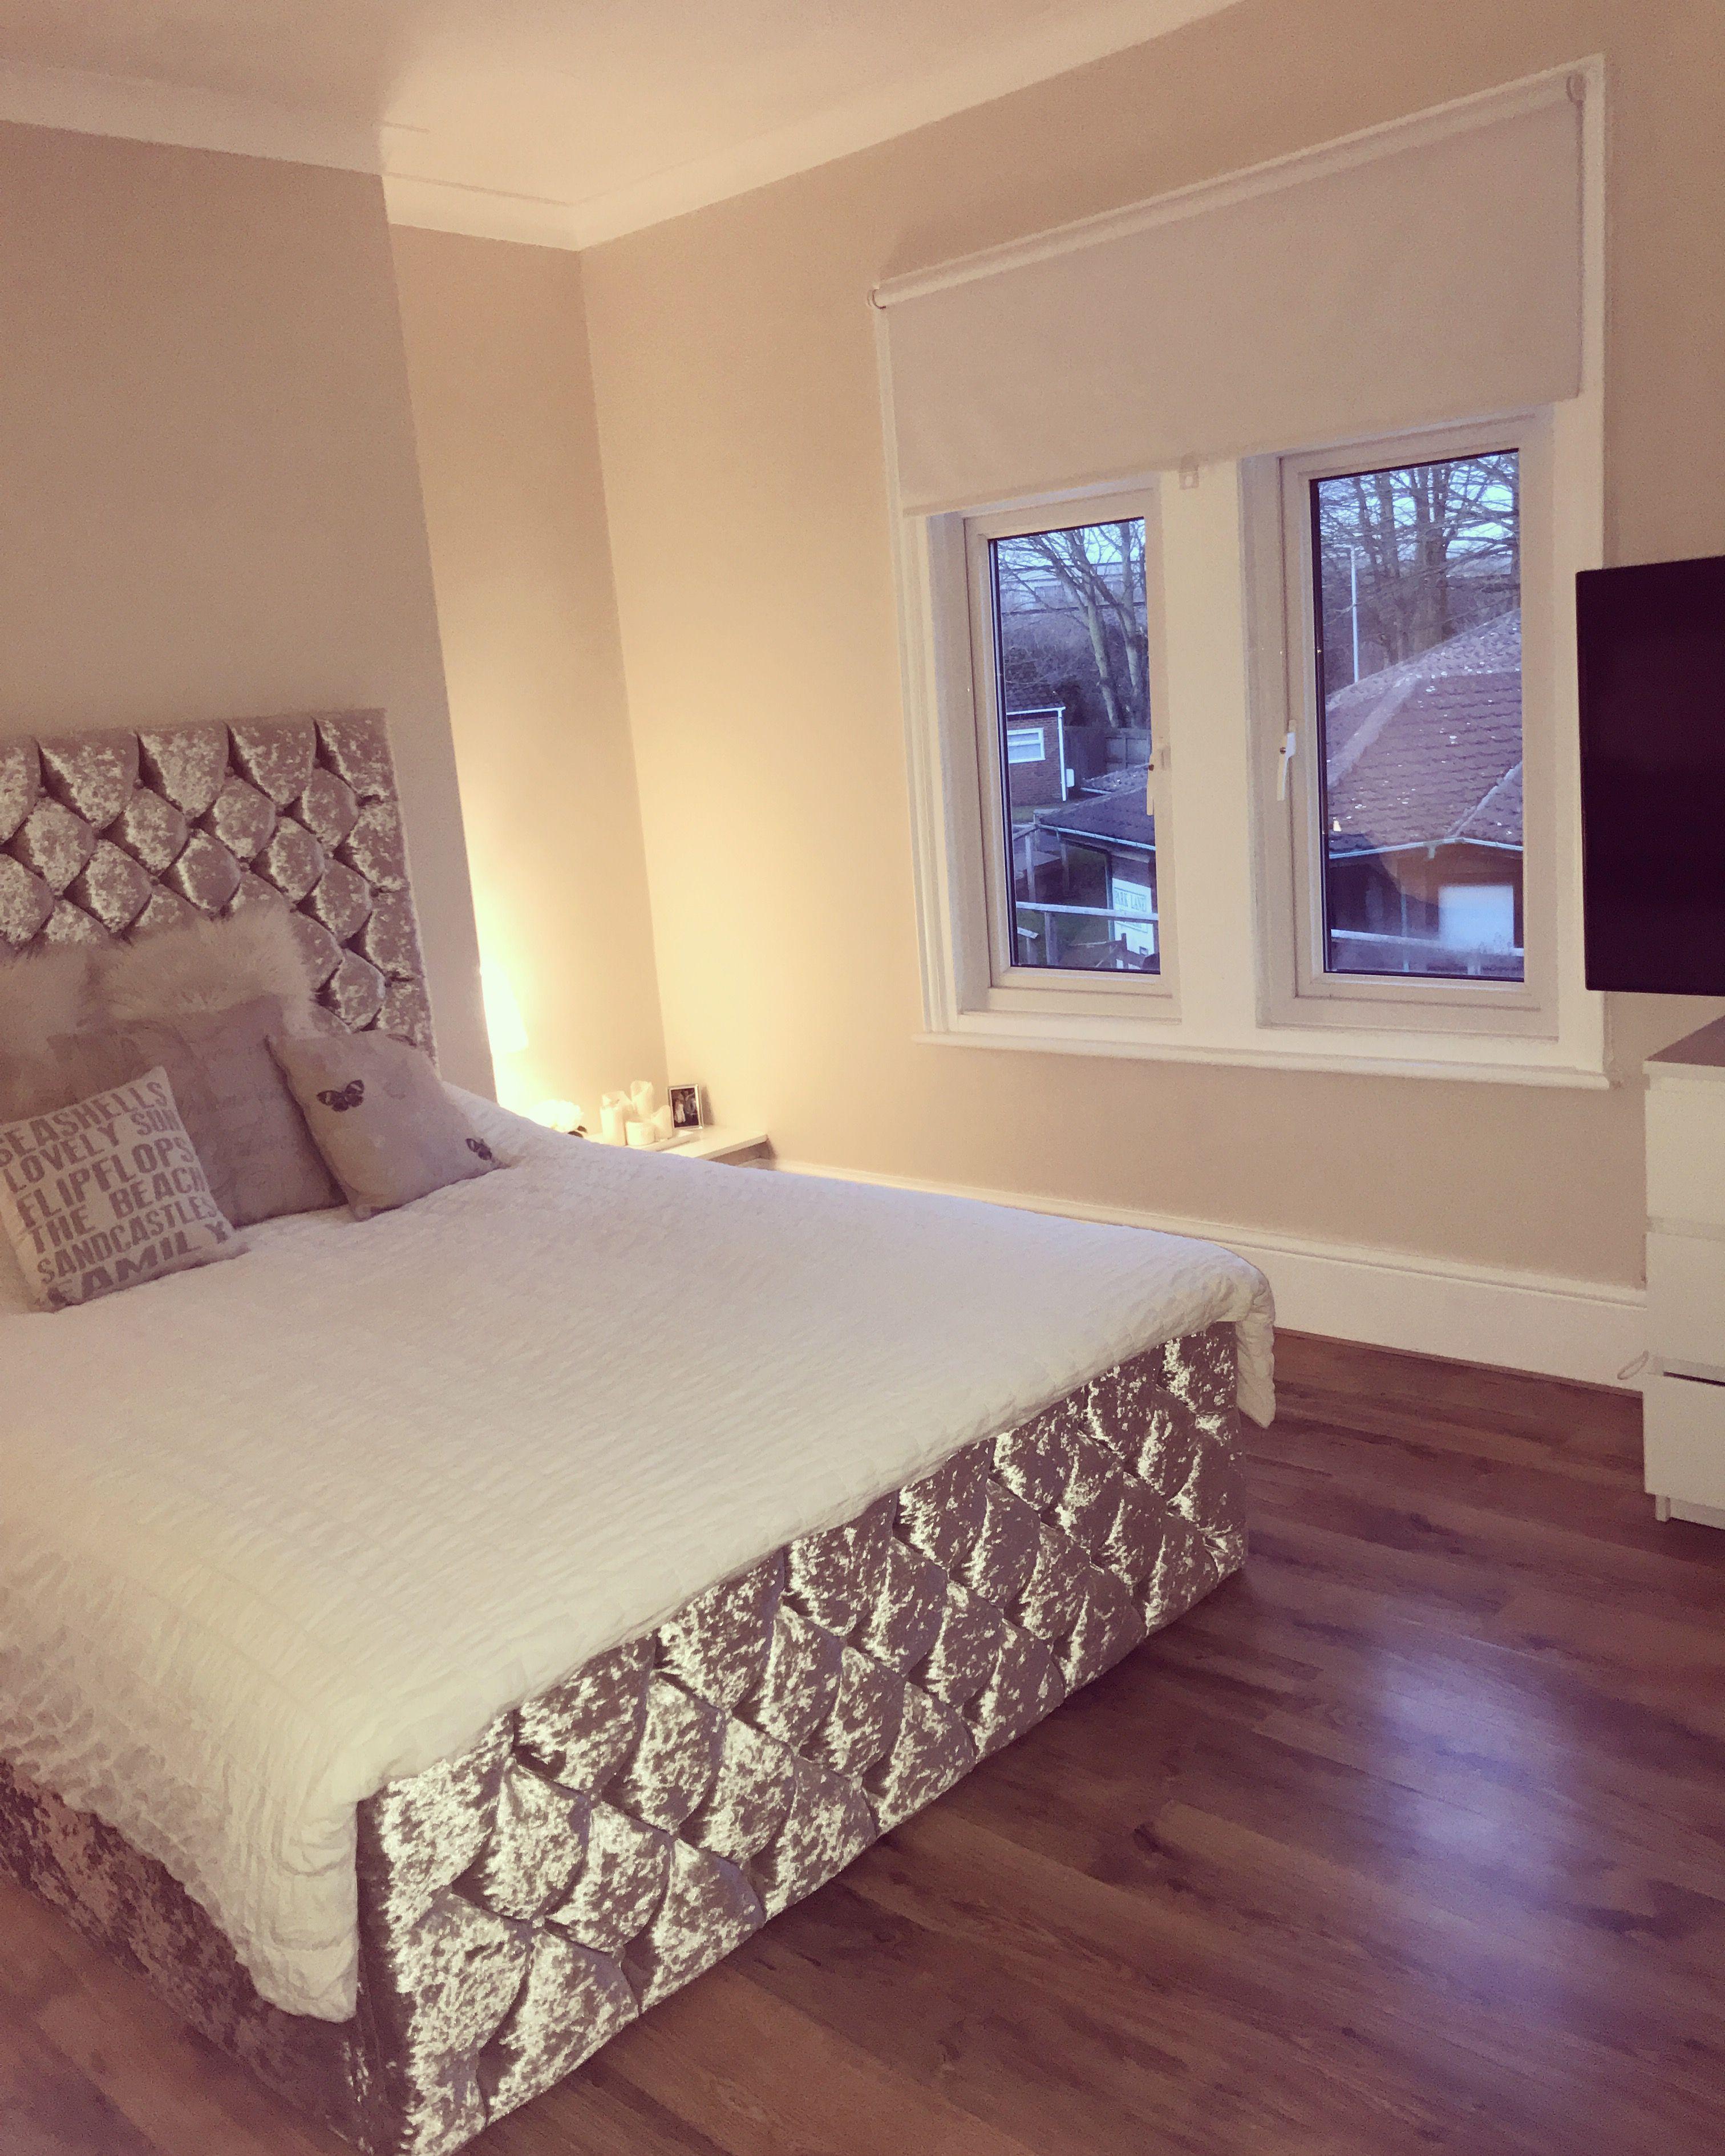 Best Crushed Velvet Bed With Wooden Floor Cream Neutral 400 x 300